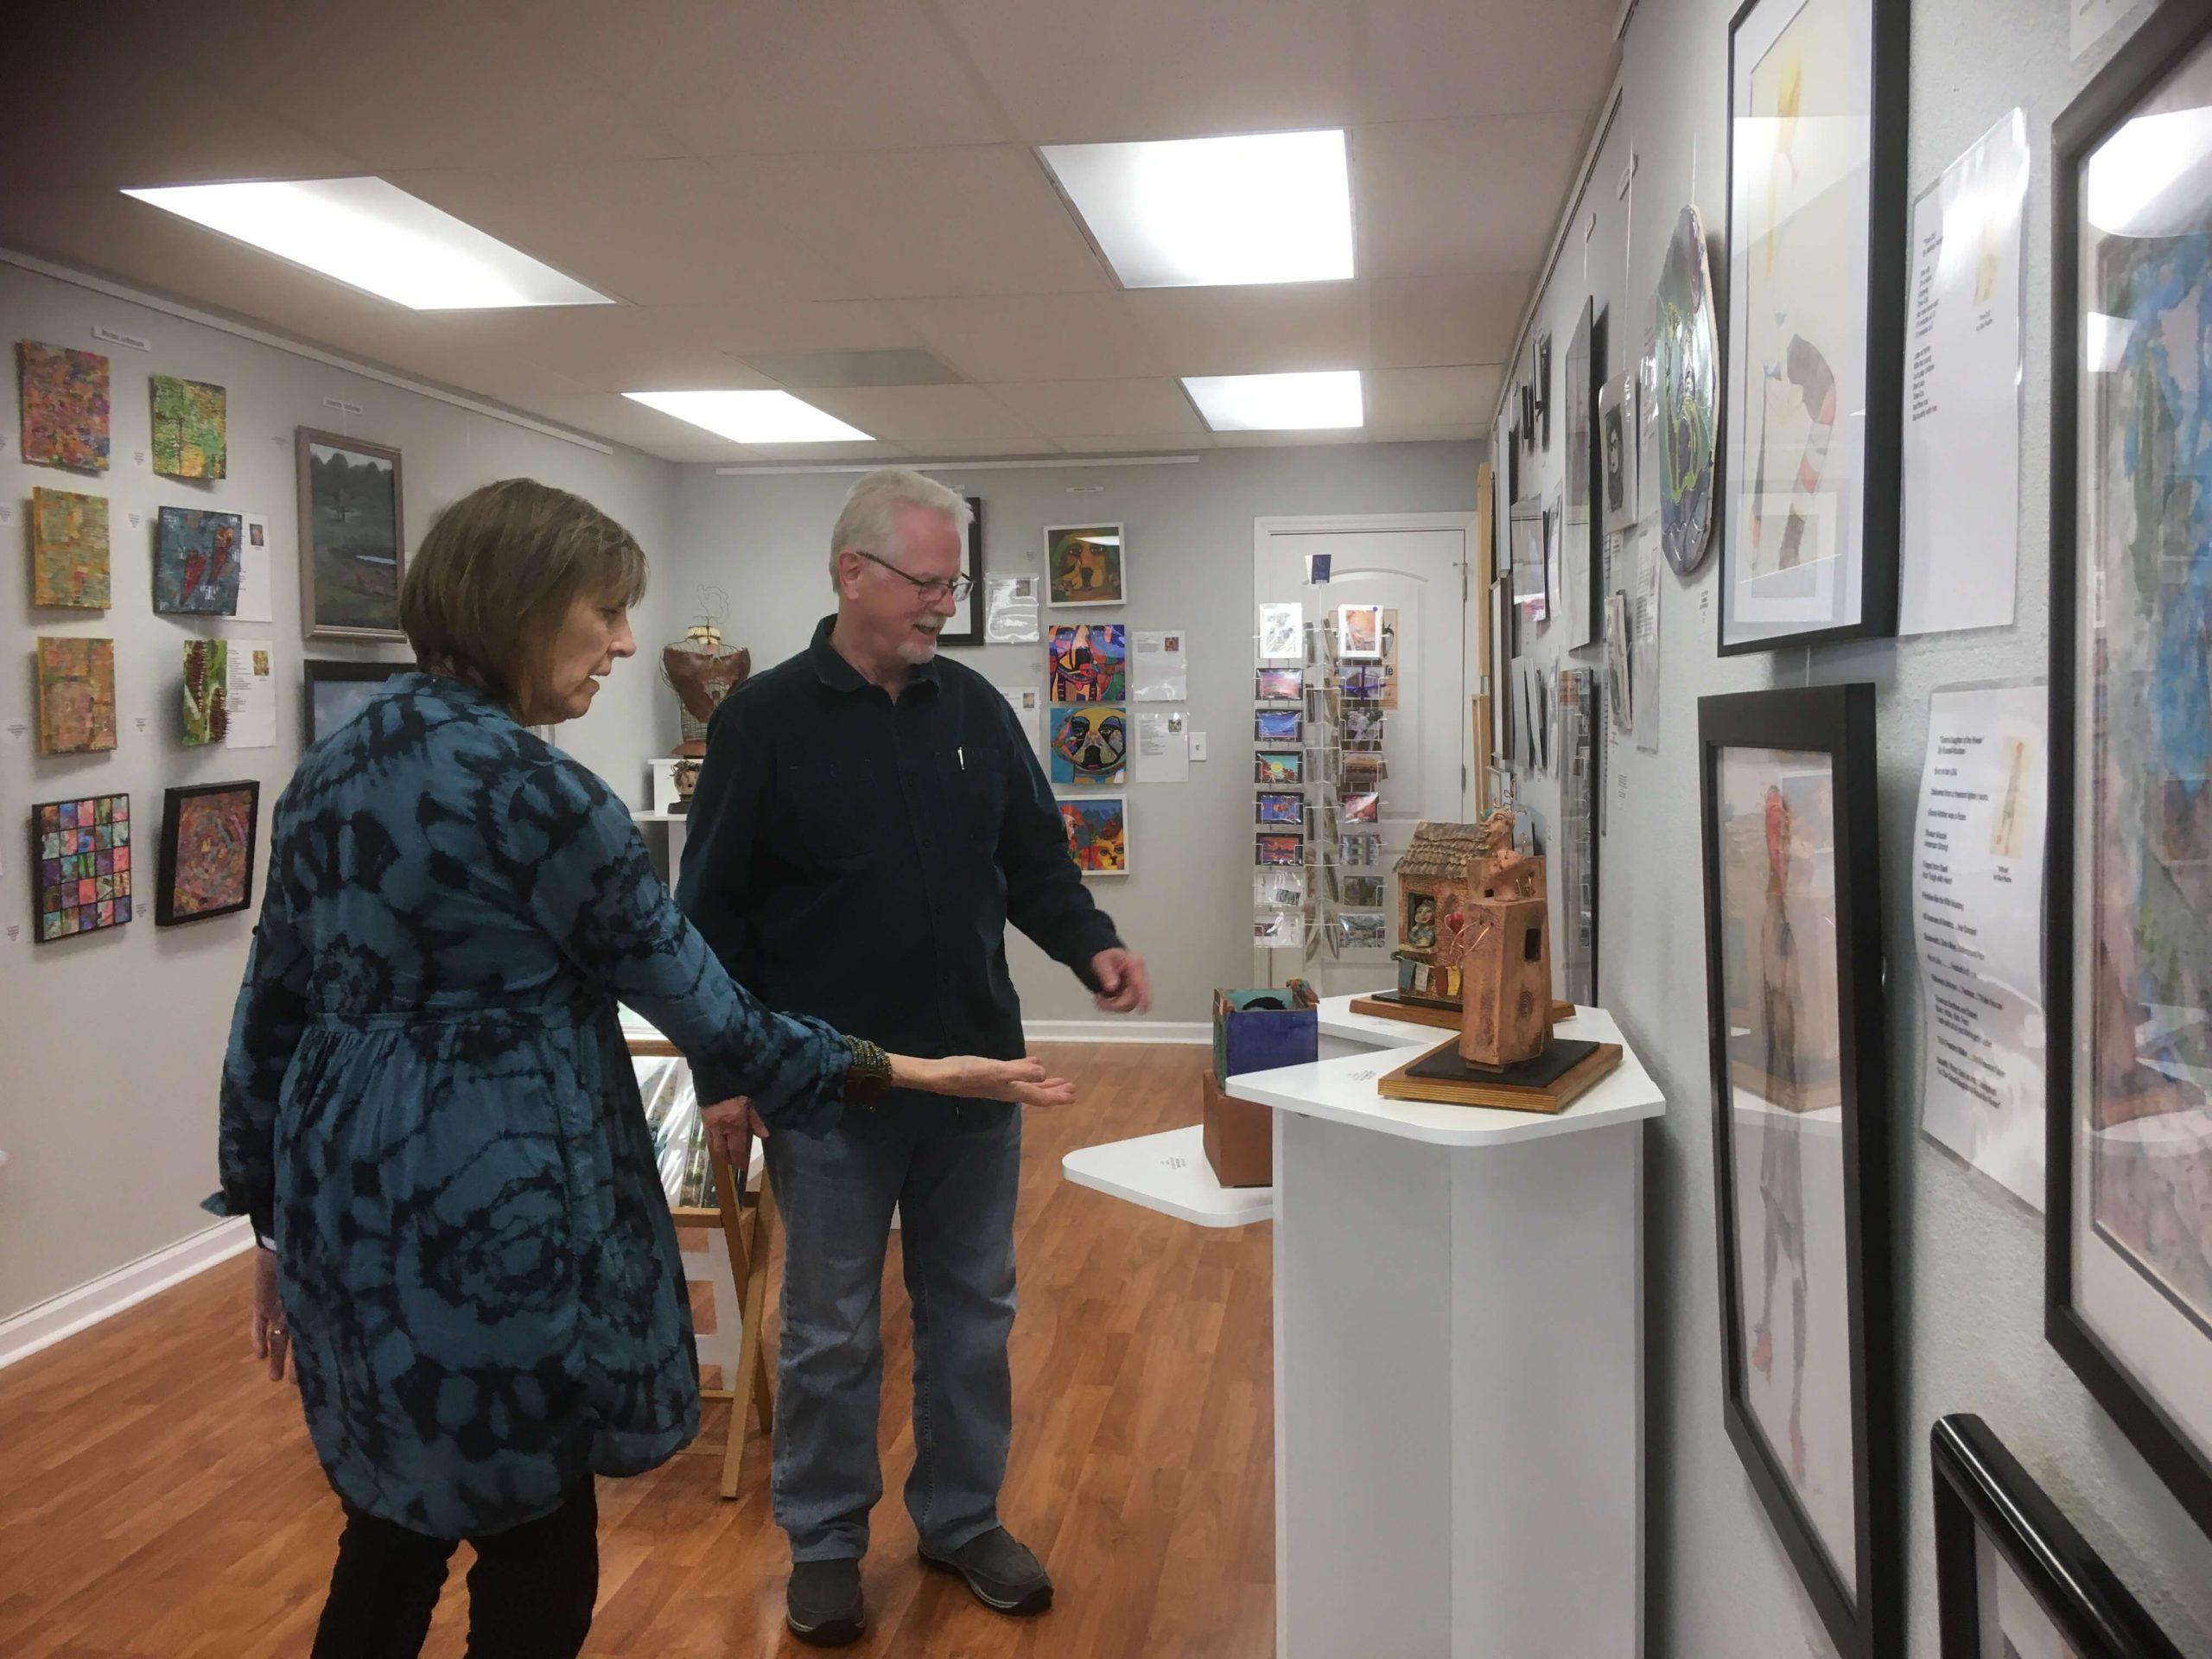 Patrons look at artwork inside HQ Gallery